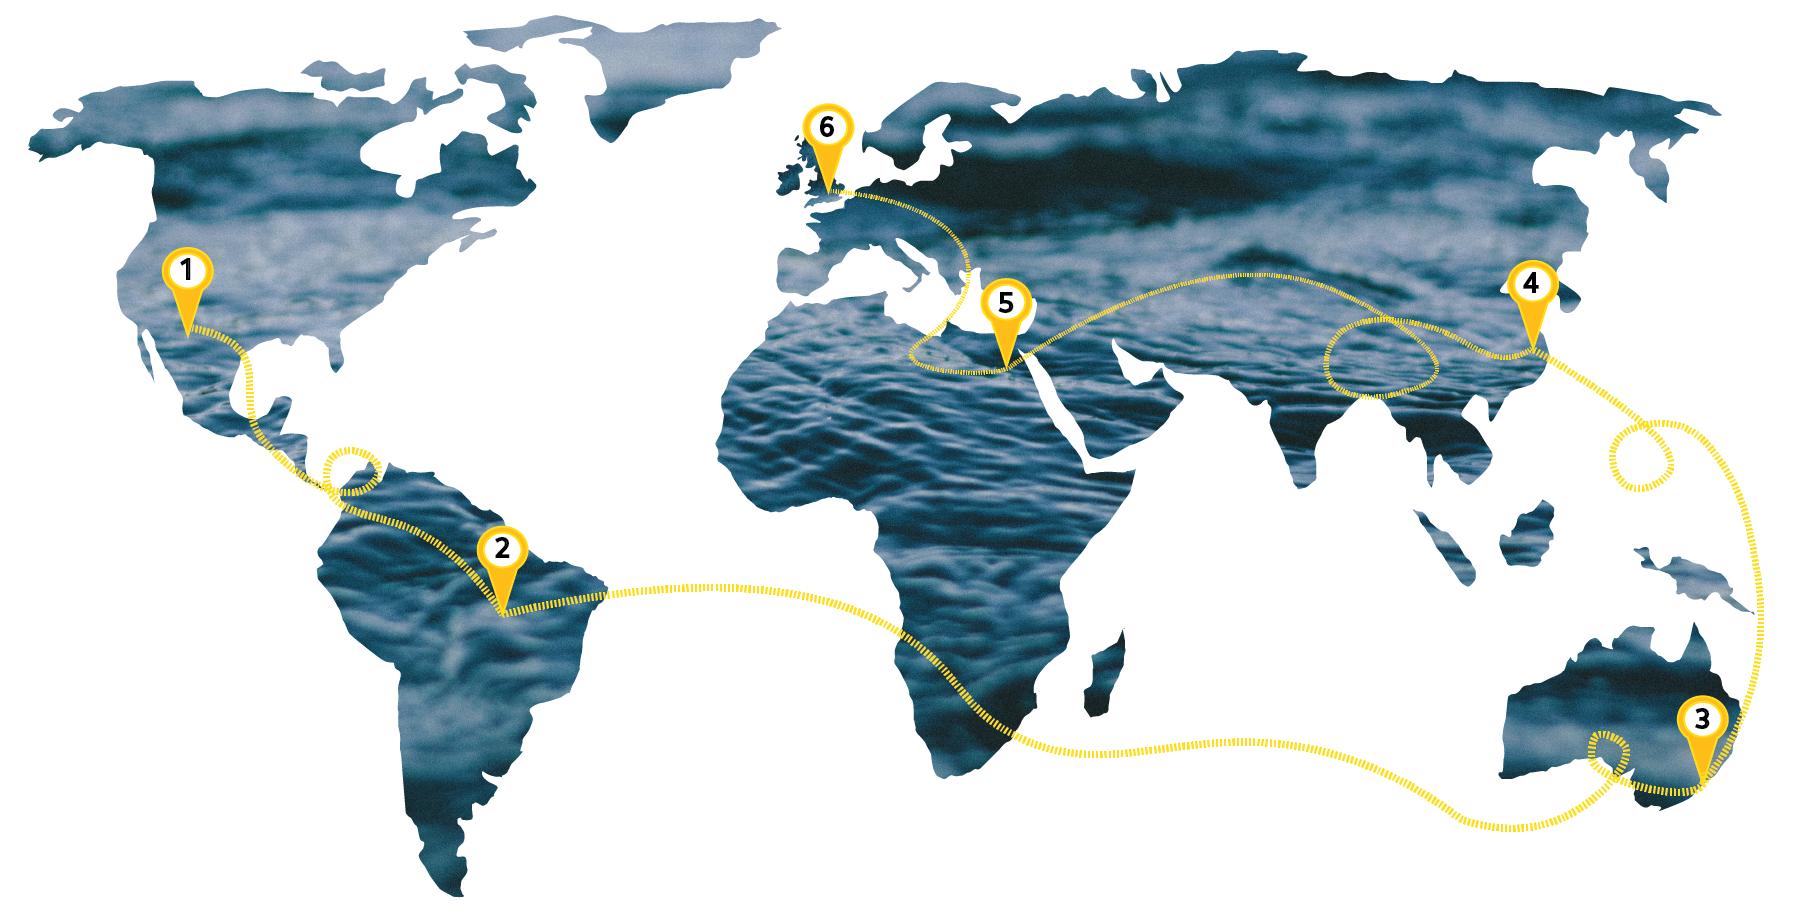 6 River Run Map #Run4water